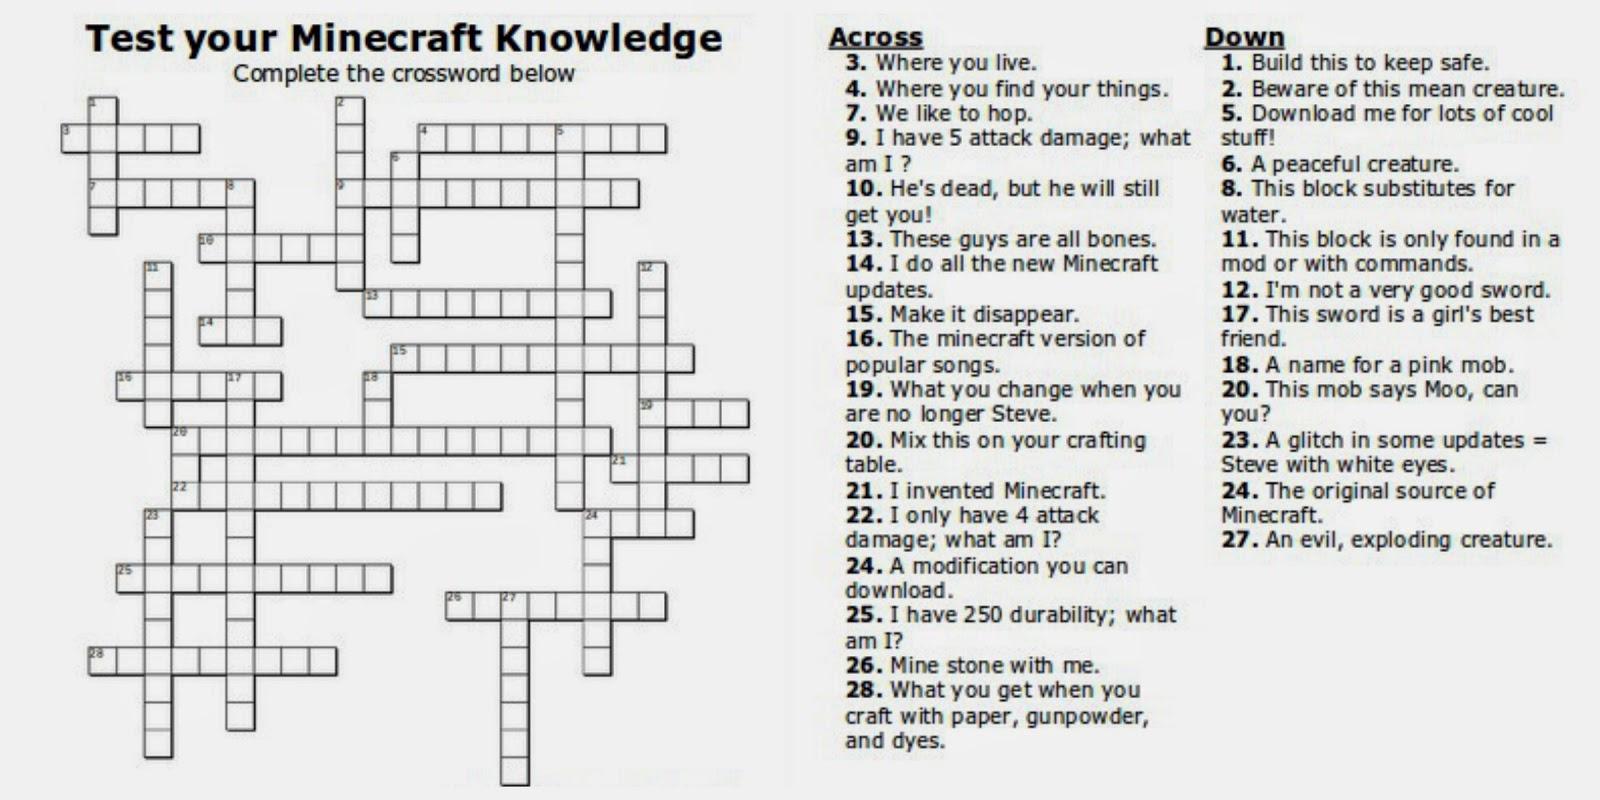 Free Printable Minecraft Crossword Search: Test Your Minecraft - Printable Crossword Puzzles For Tweens